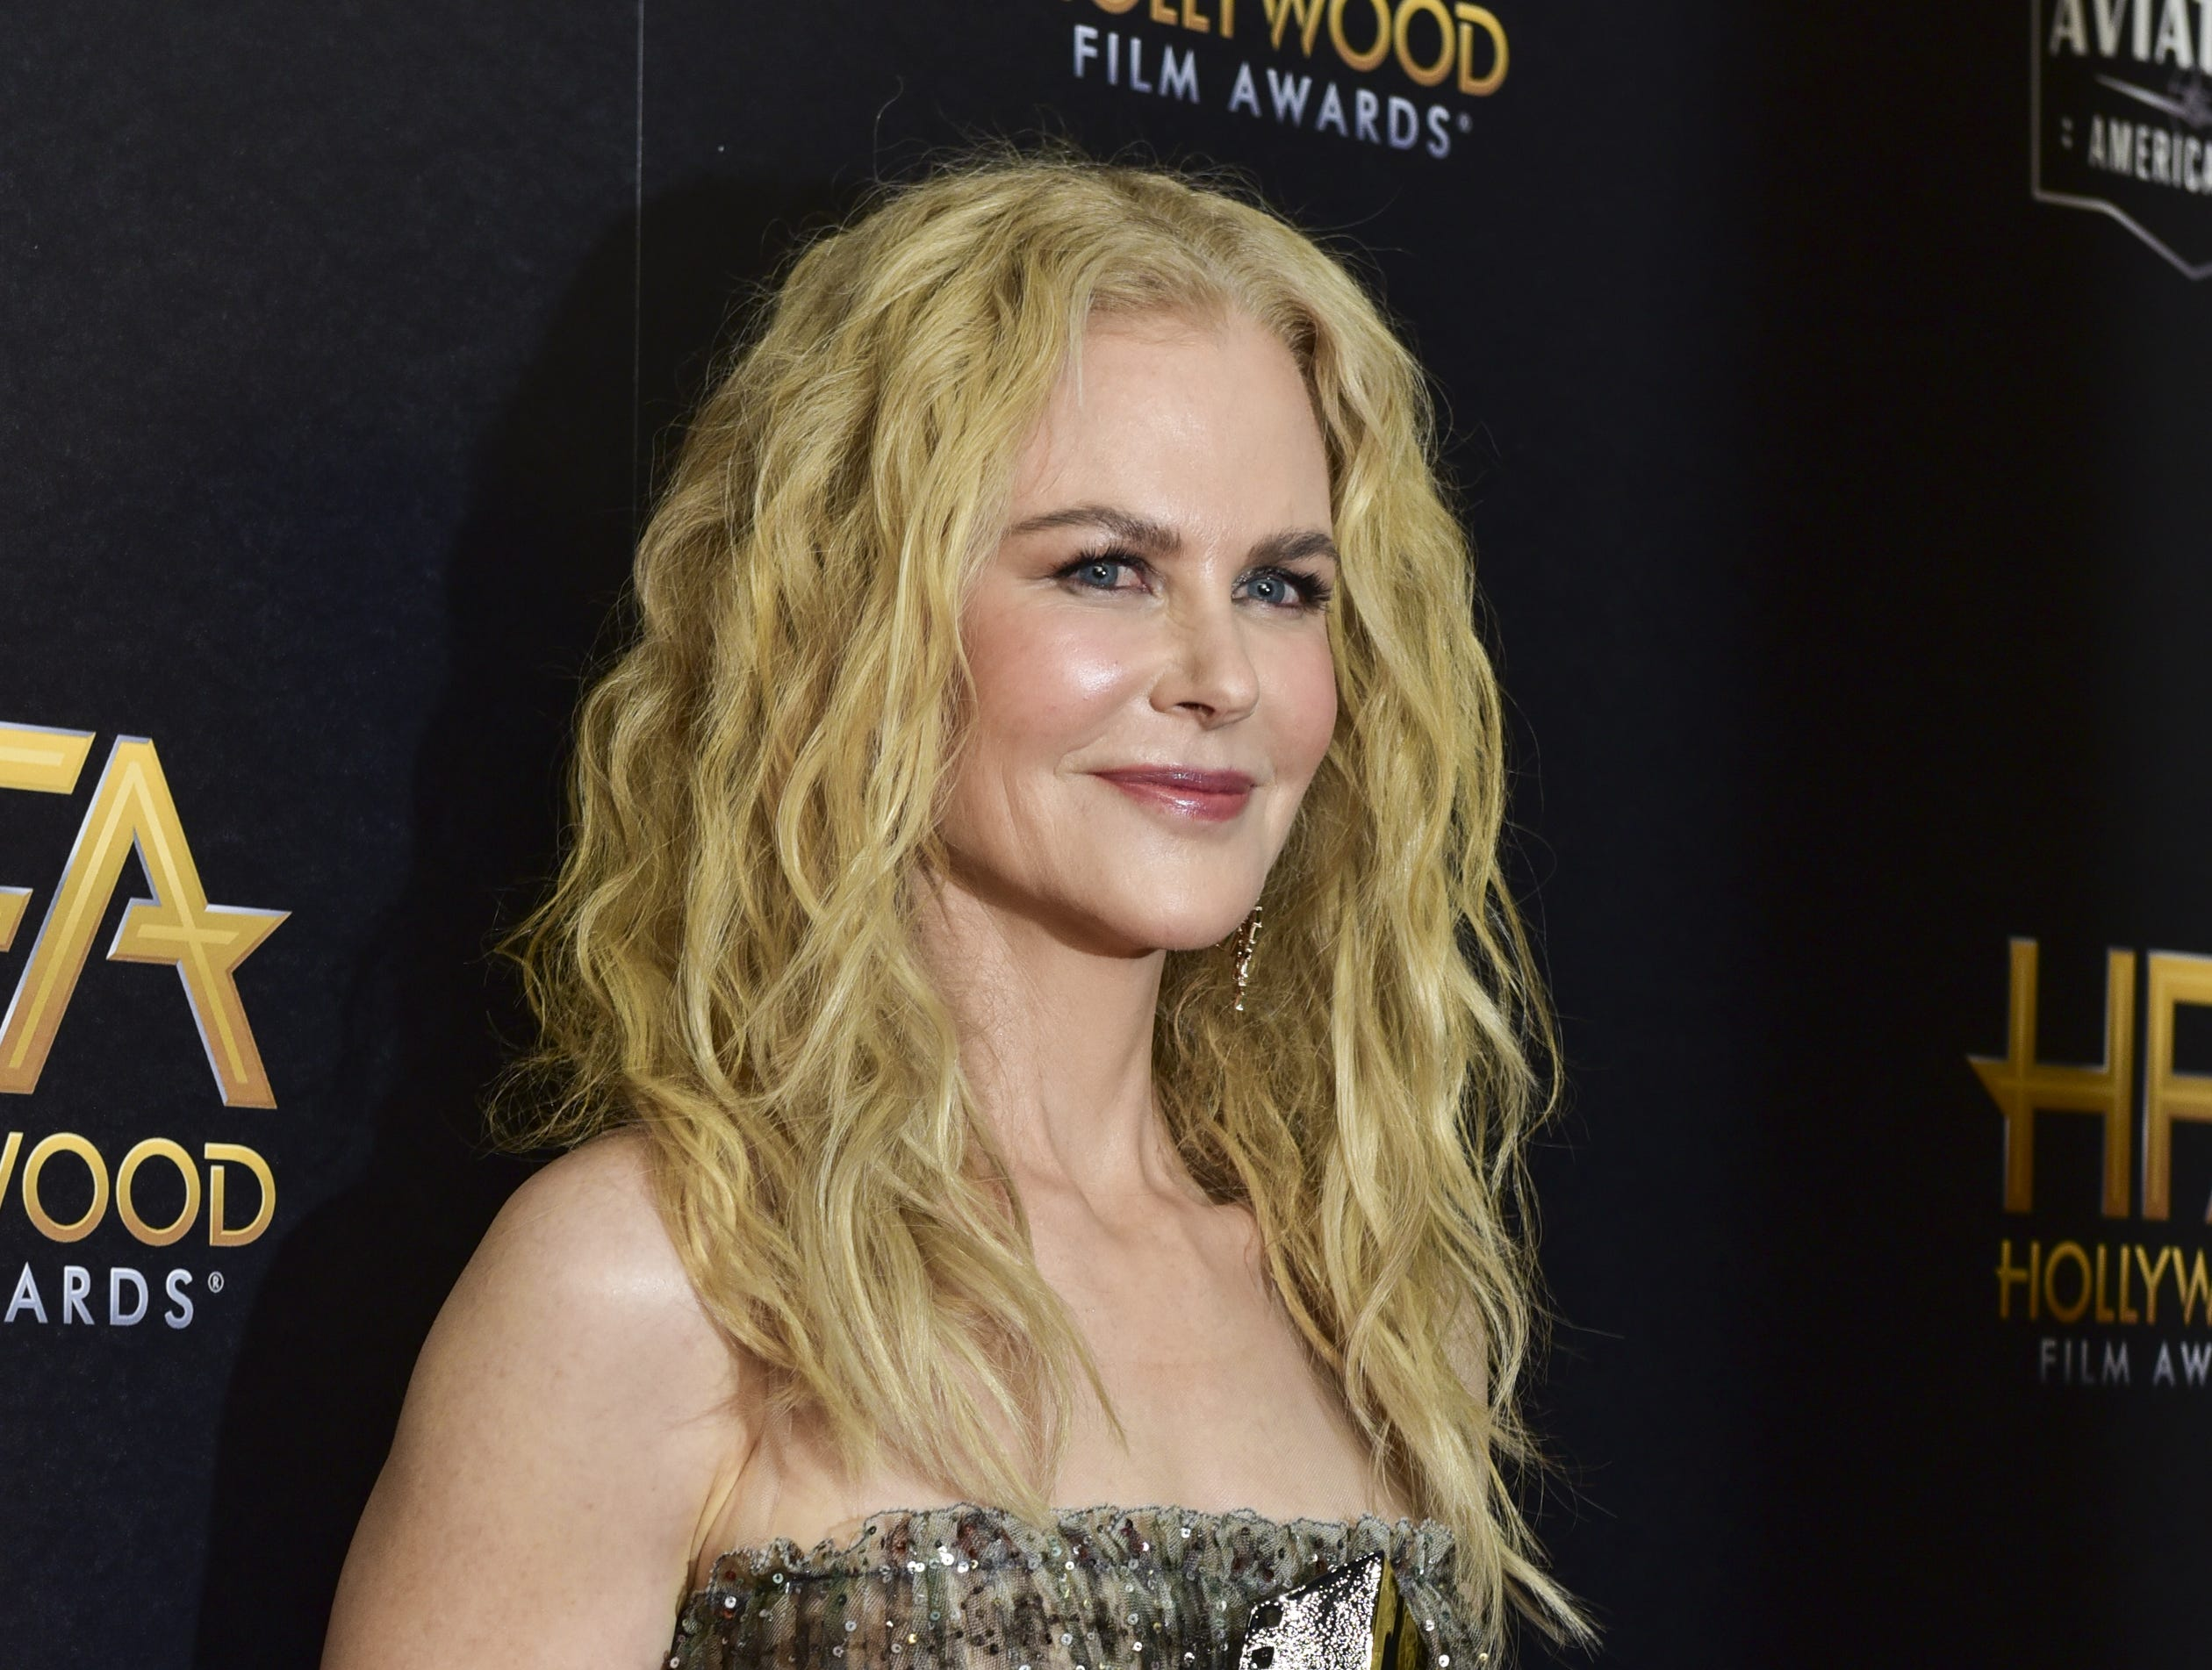 November 4: Nicole Kidman poses at the Hollywood Film Awards.